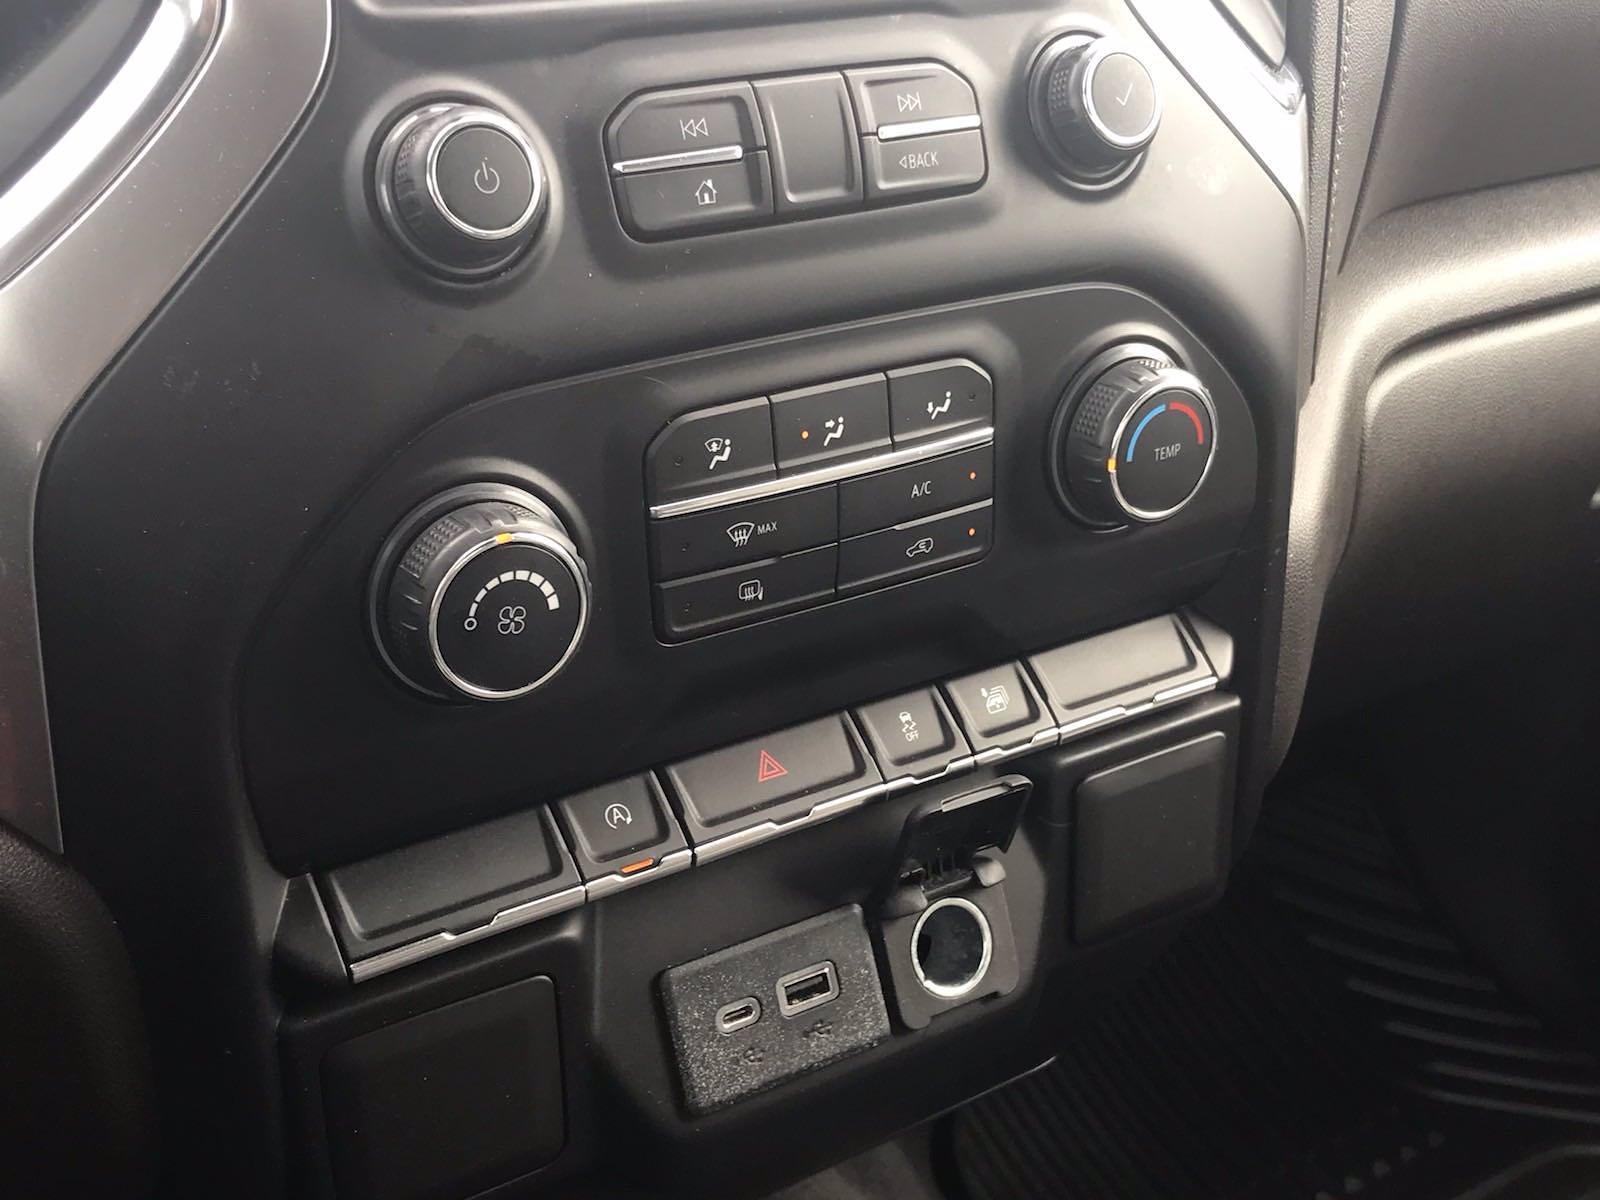 2020 Chevrolet Silverado 1500 Crew Cab 4x4, Pickup #16467P - photo 33